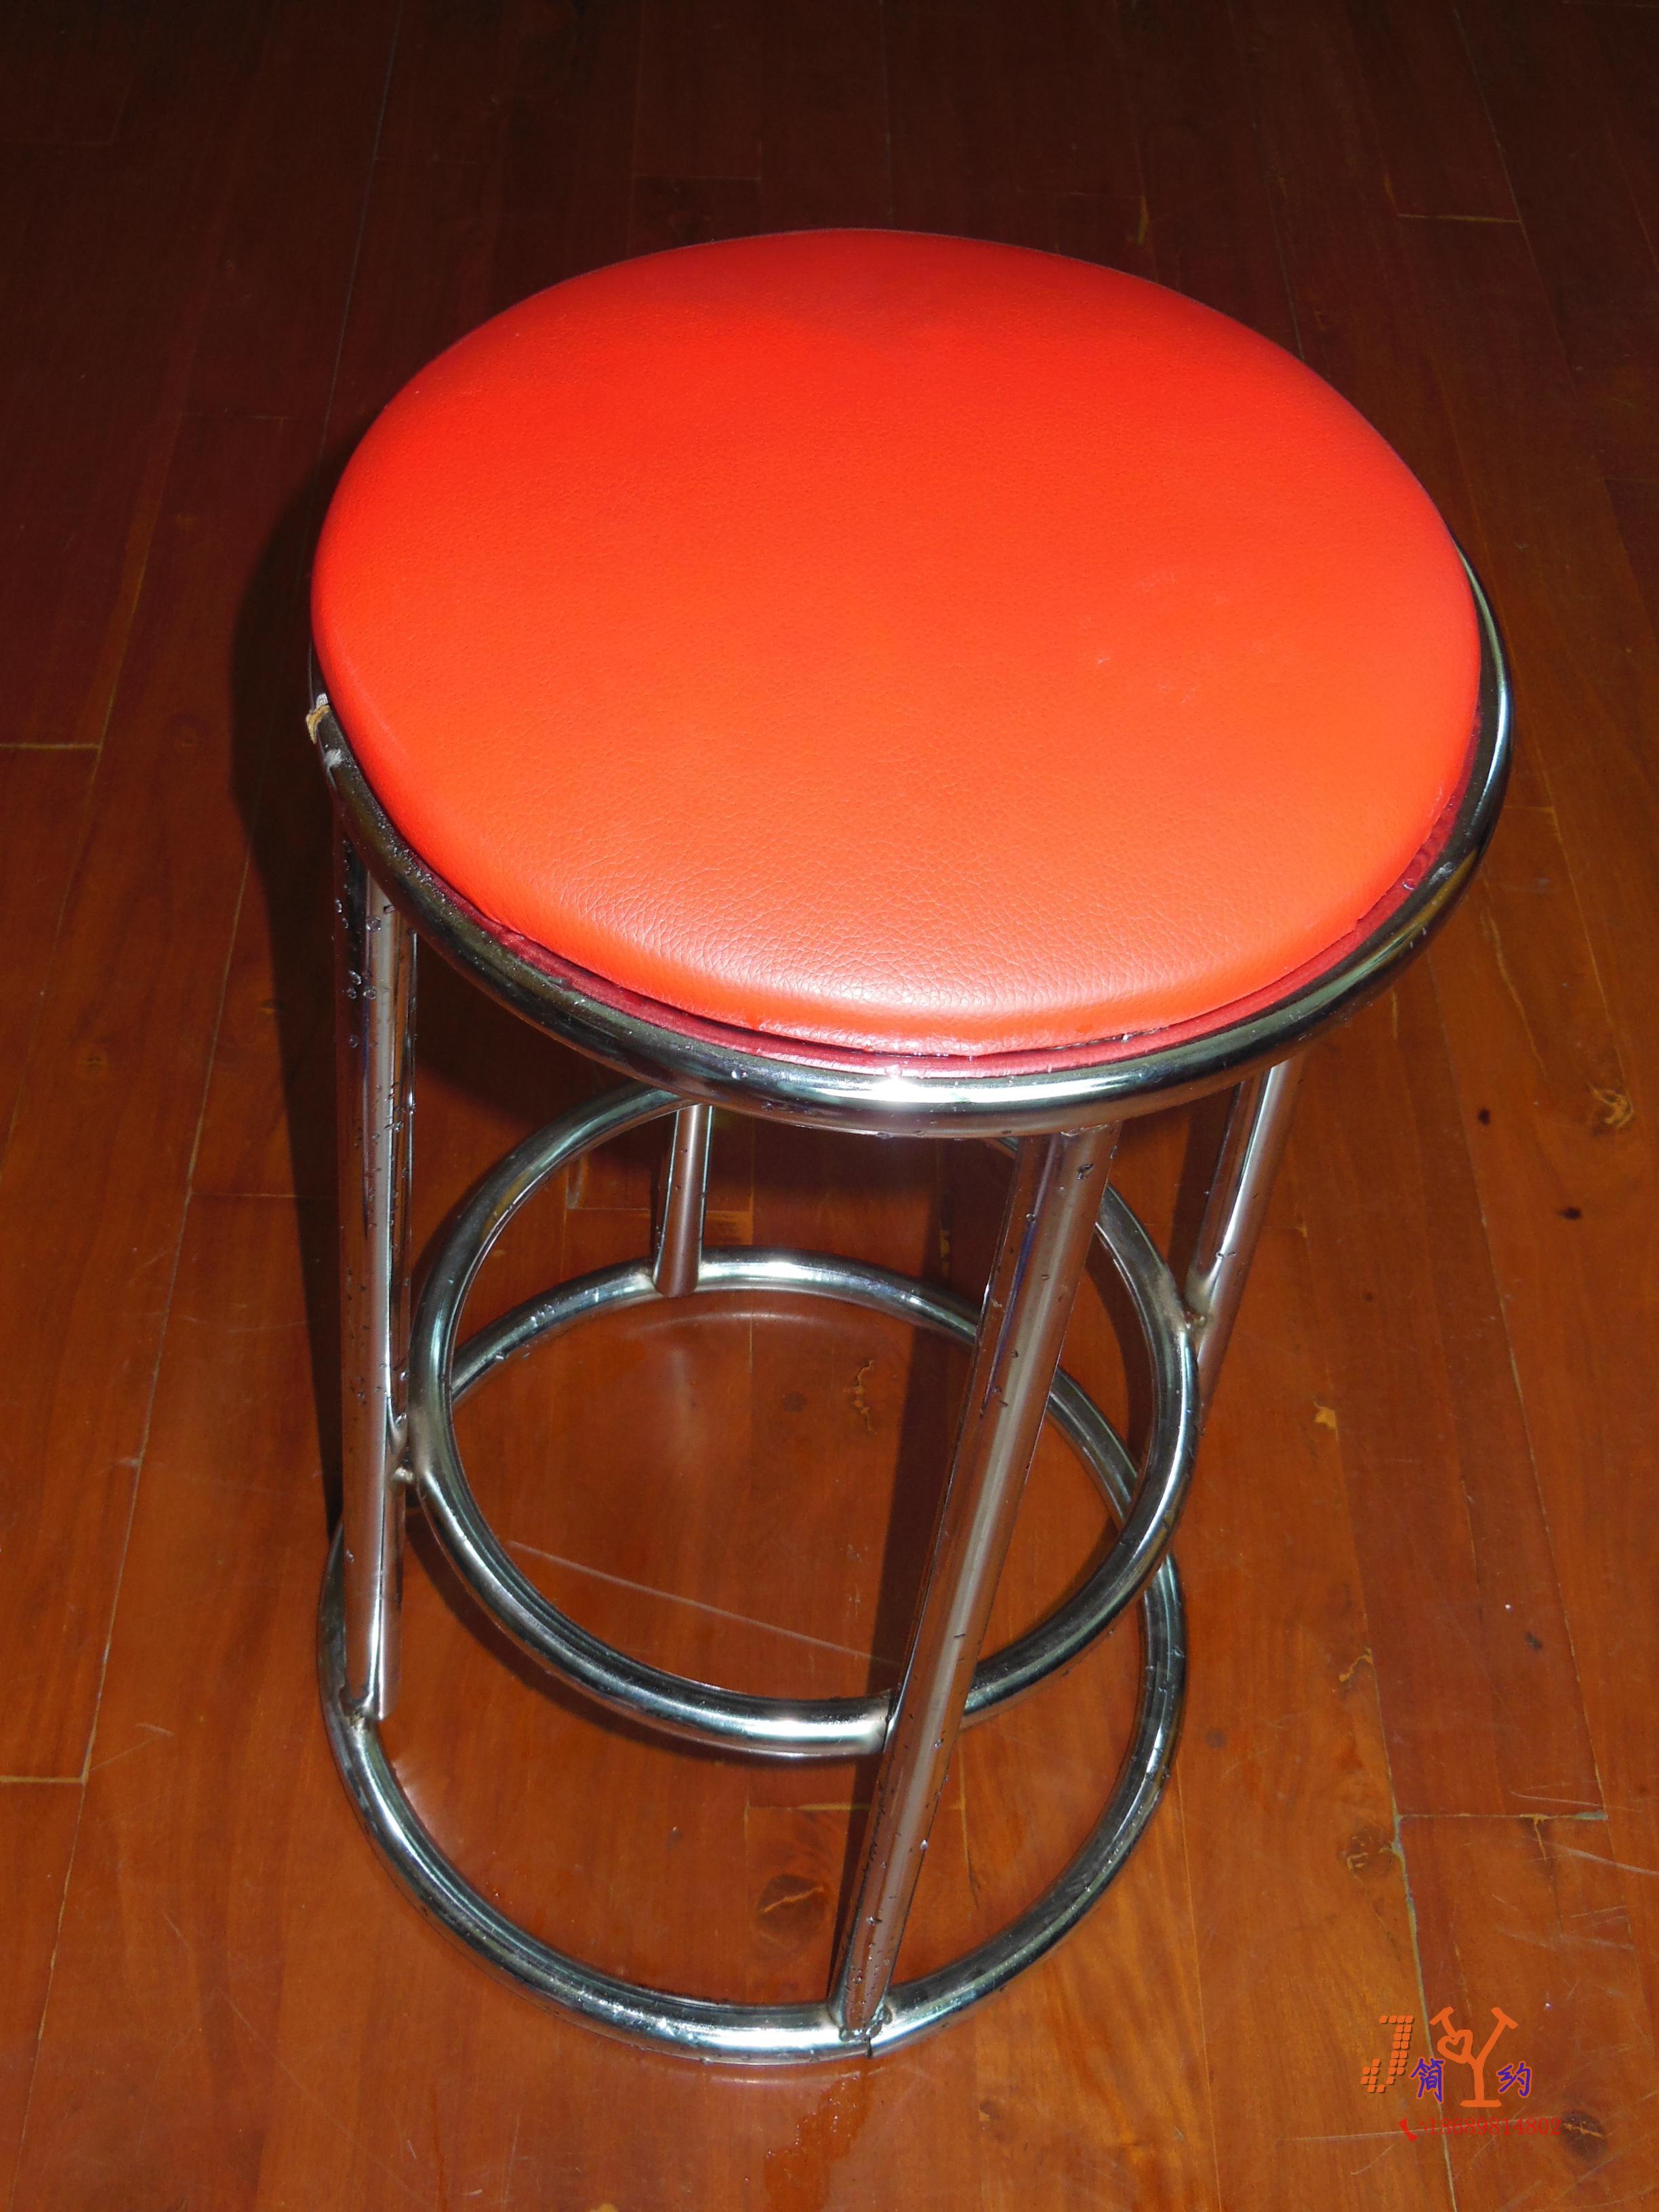 ktv酒吧三圈吧台椅 高脚凳子 圆面柜台凳 不锈钢凳子特价直销图片